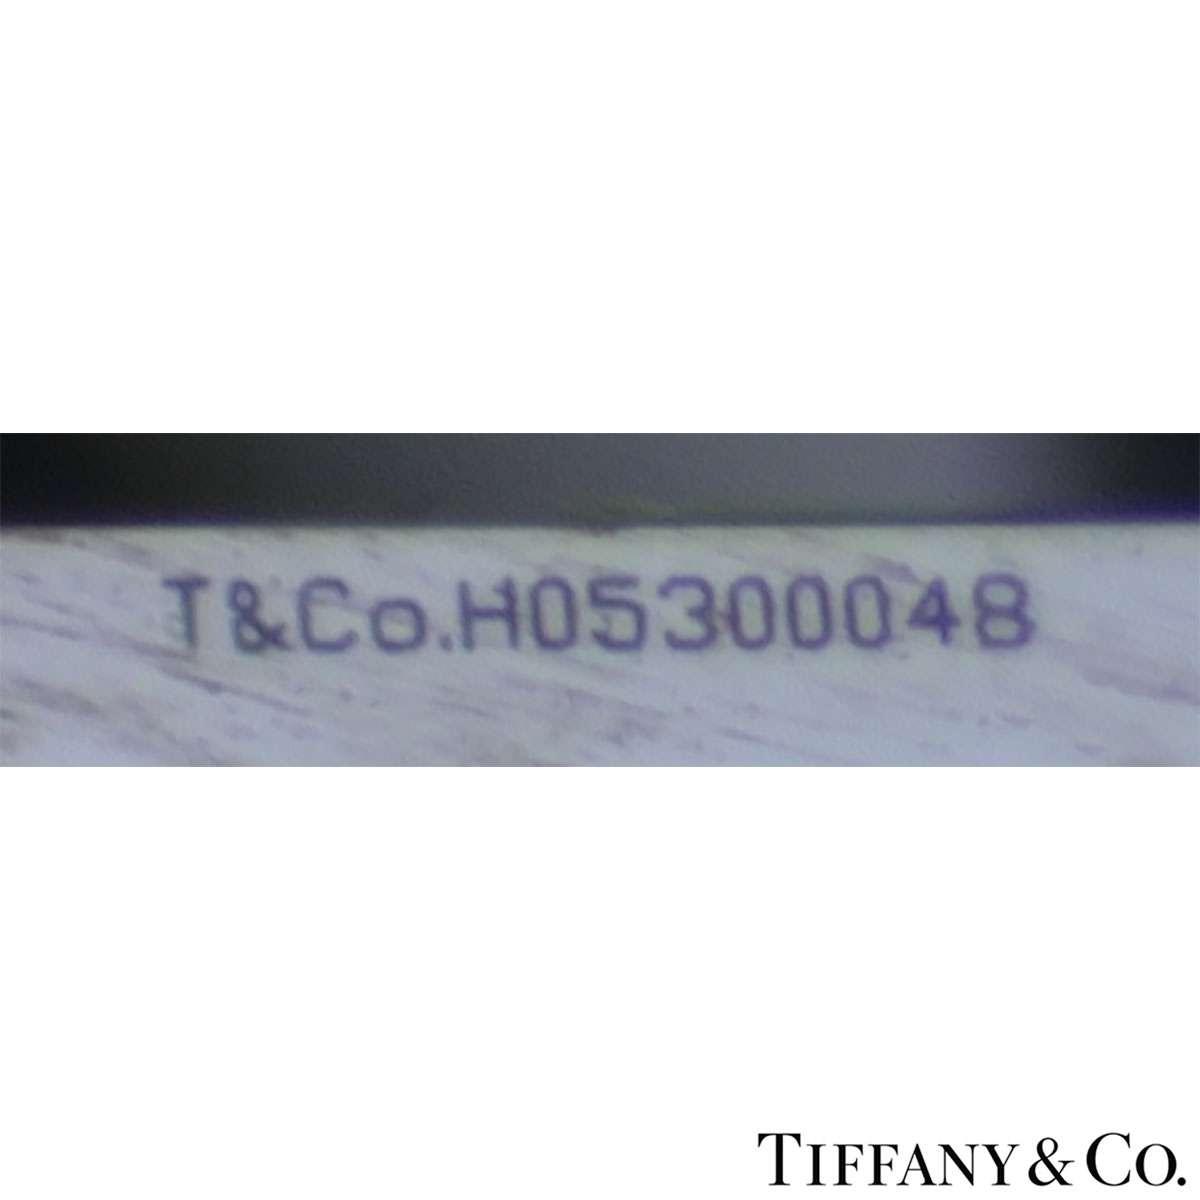 Tiffany & Co. Platinum Diamond Setting Ring 1.27ct G/VS1